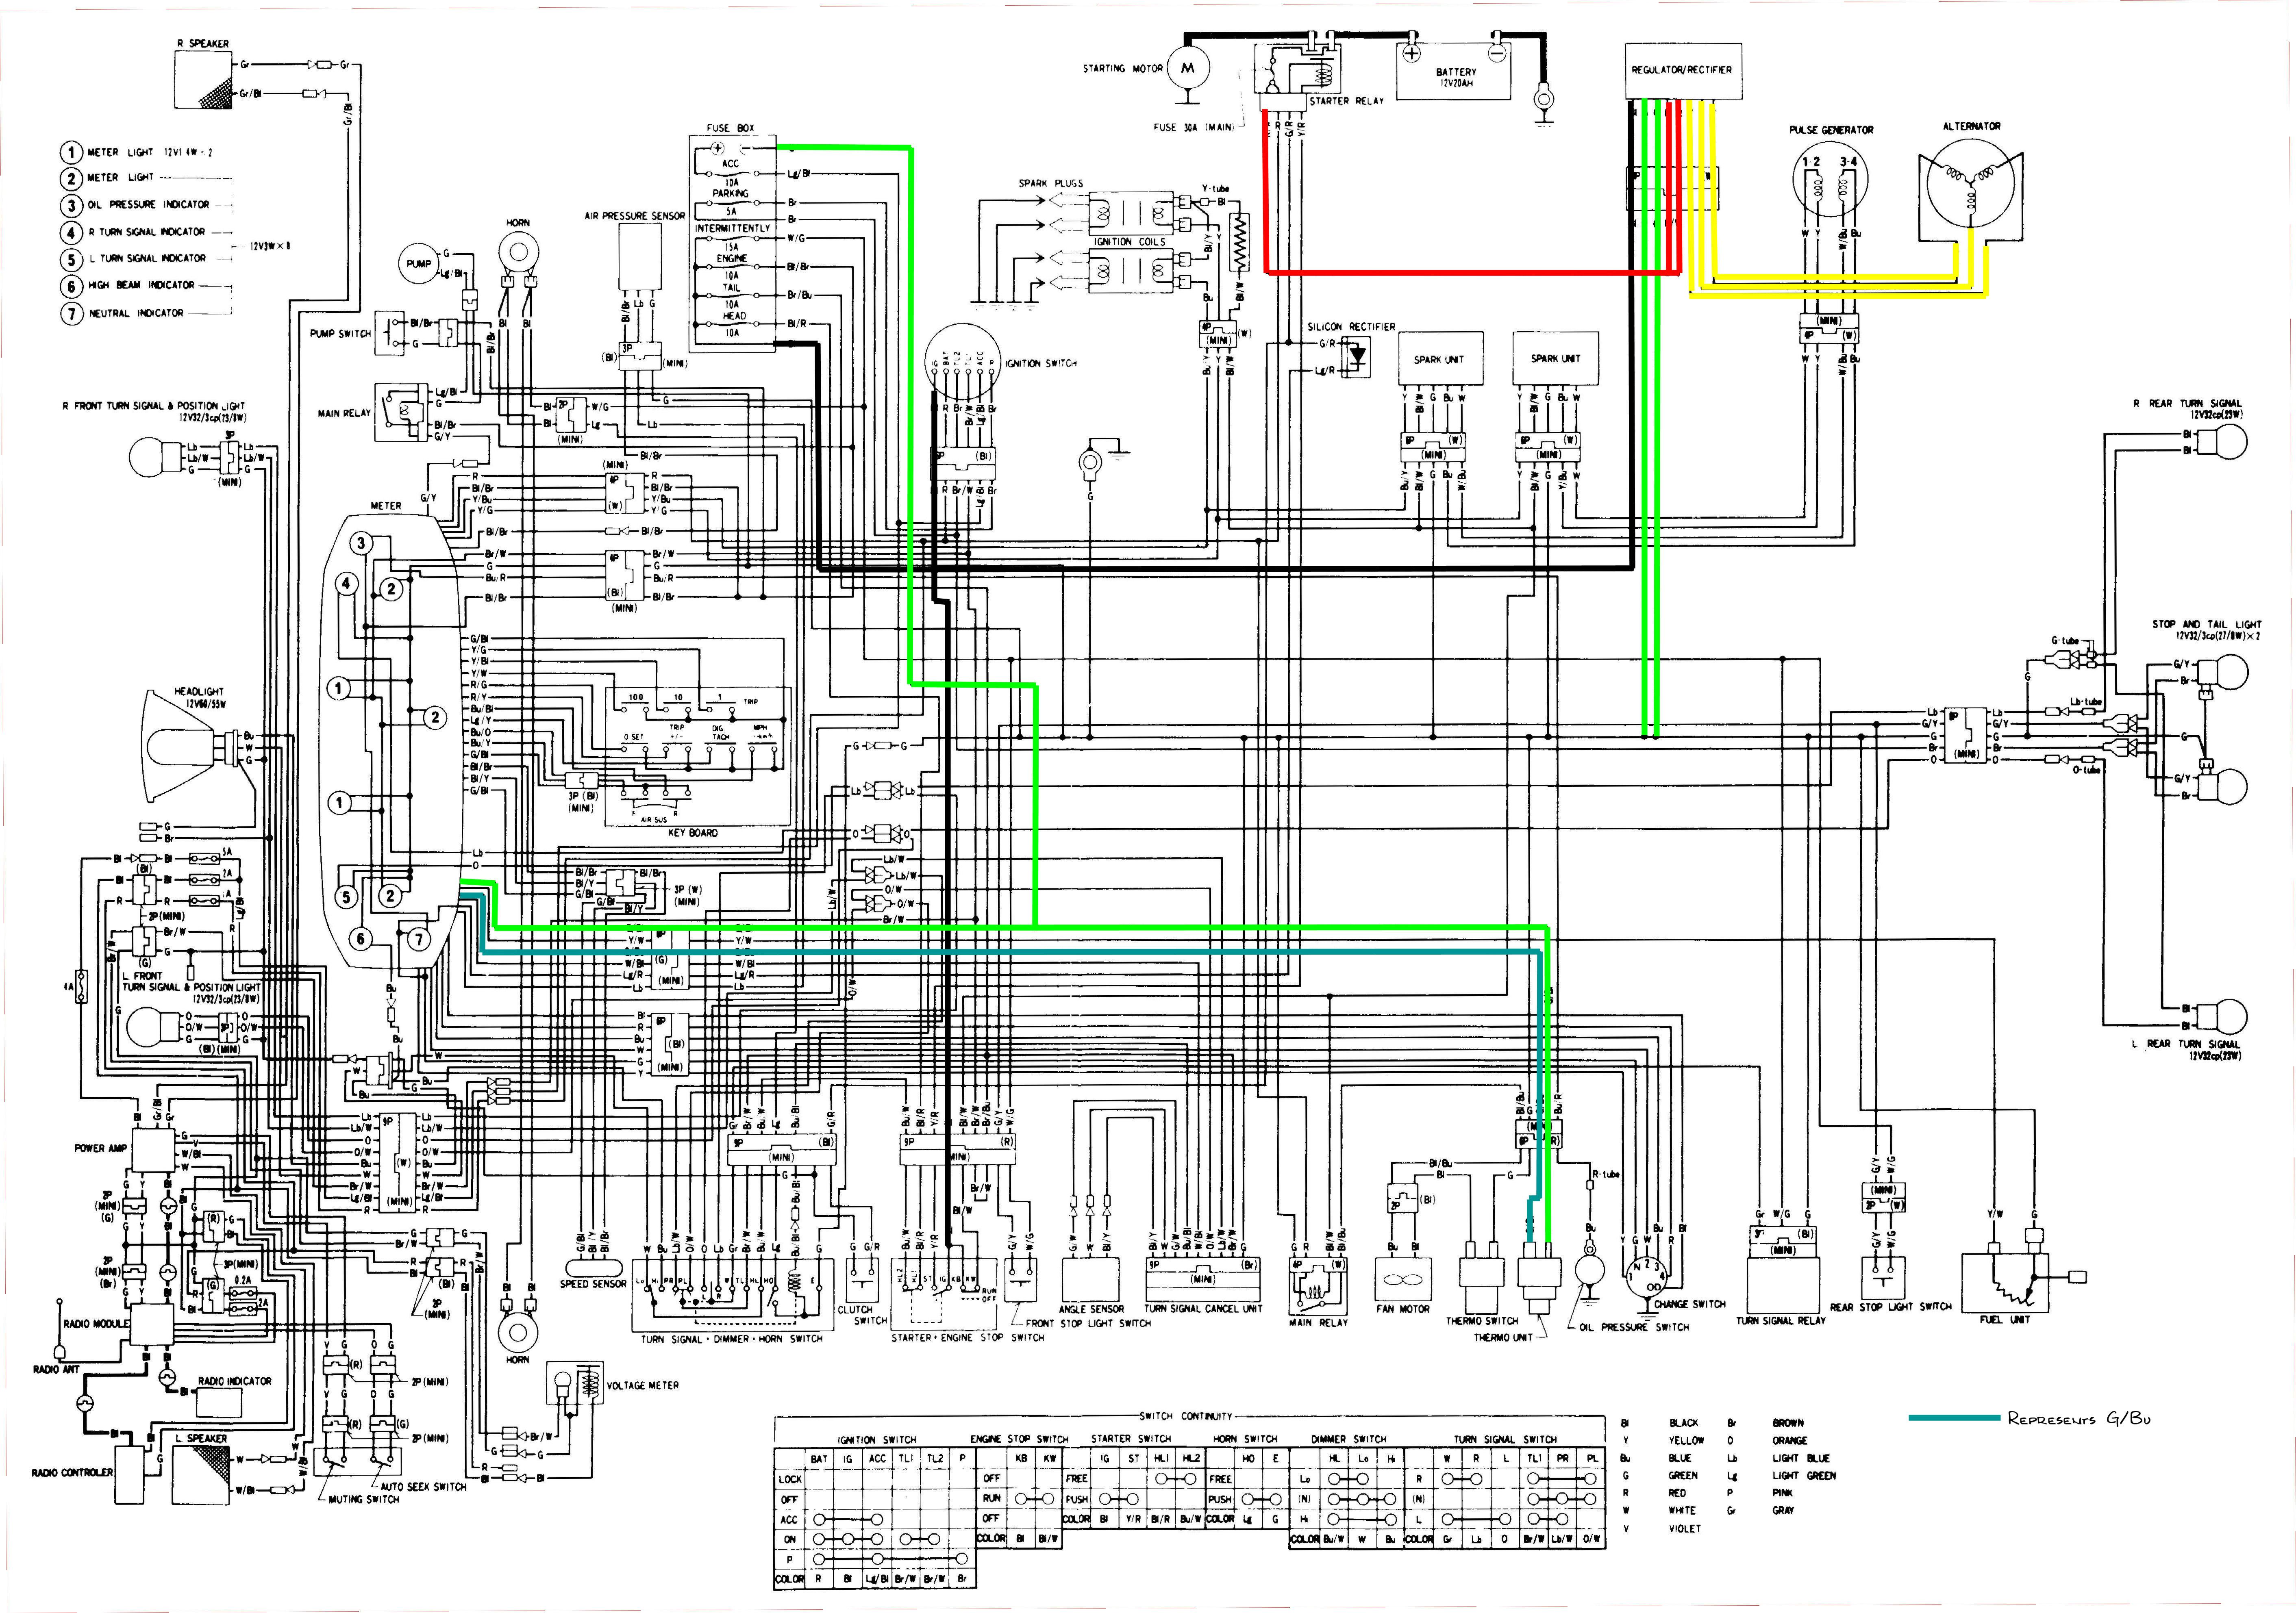 Handle Switch Vtx1800c234 besides 4031 Rotor Honda Vtx1800 furthermore Wholesale 250 Honda Rebel as well Georgetown Electrical Wiring Diagram in addition Honda Vtx 1800 Fuse Box. on 2002 honda vtx 1800